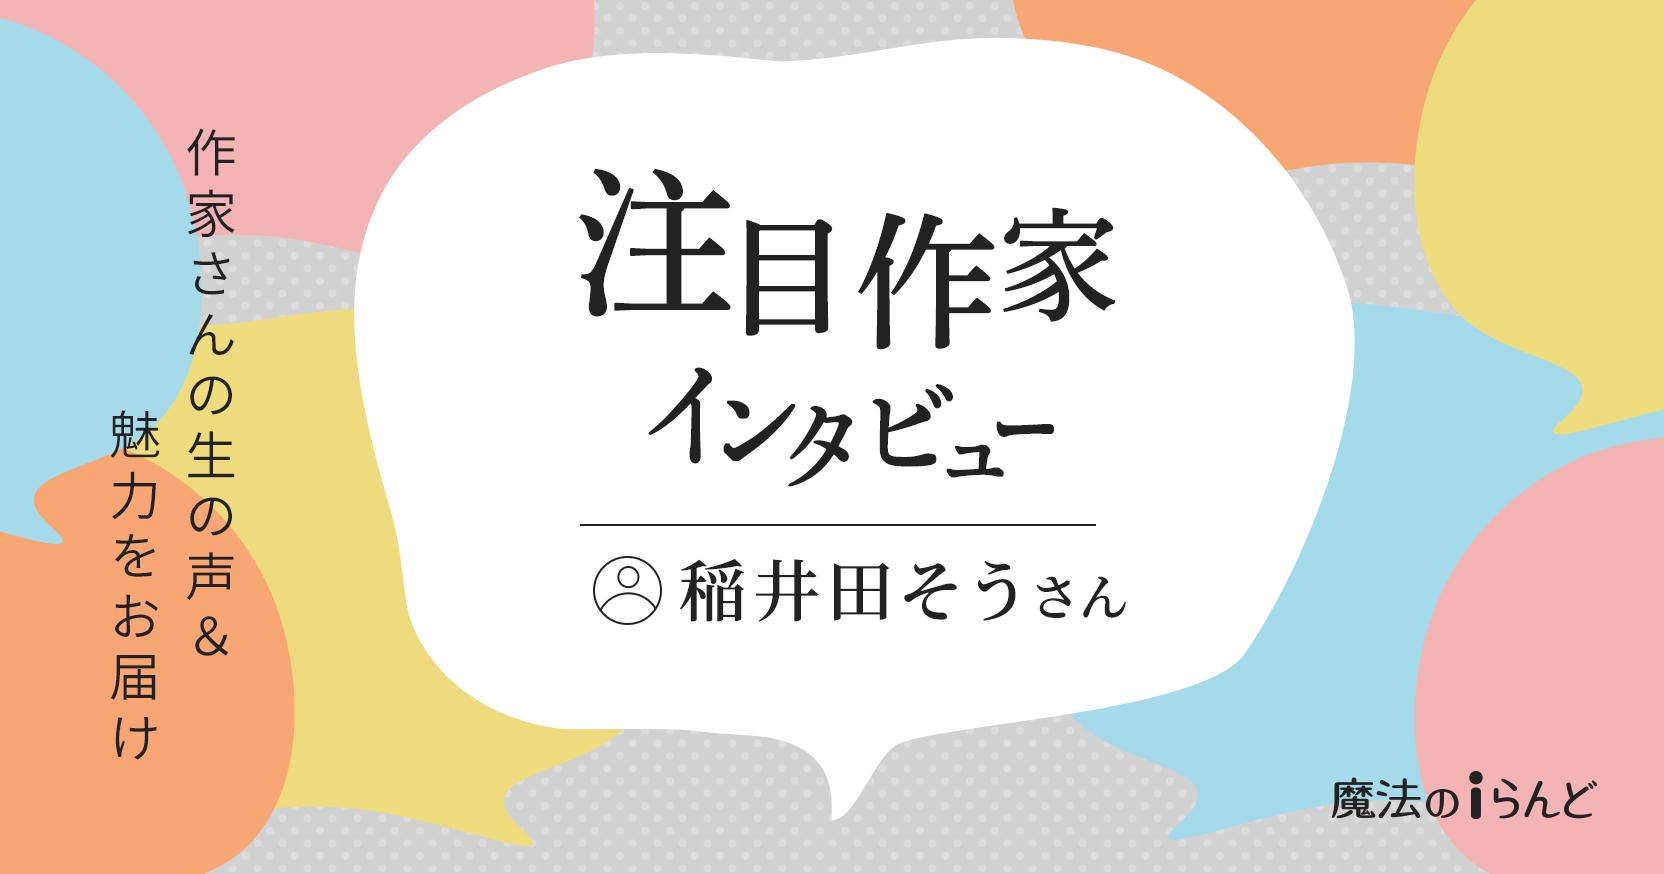 https://storage.googleapis.com/blog-info/entry/2021/02/interview_ogp_inaida.png